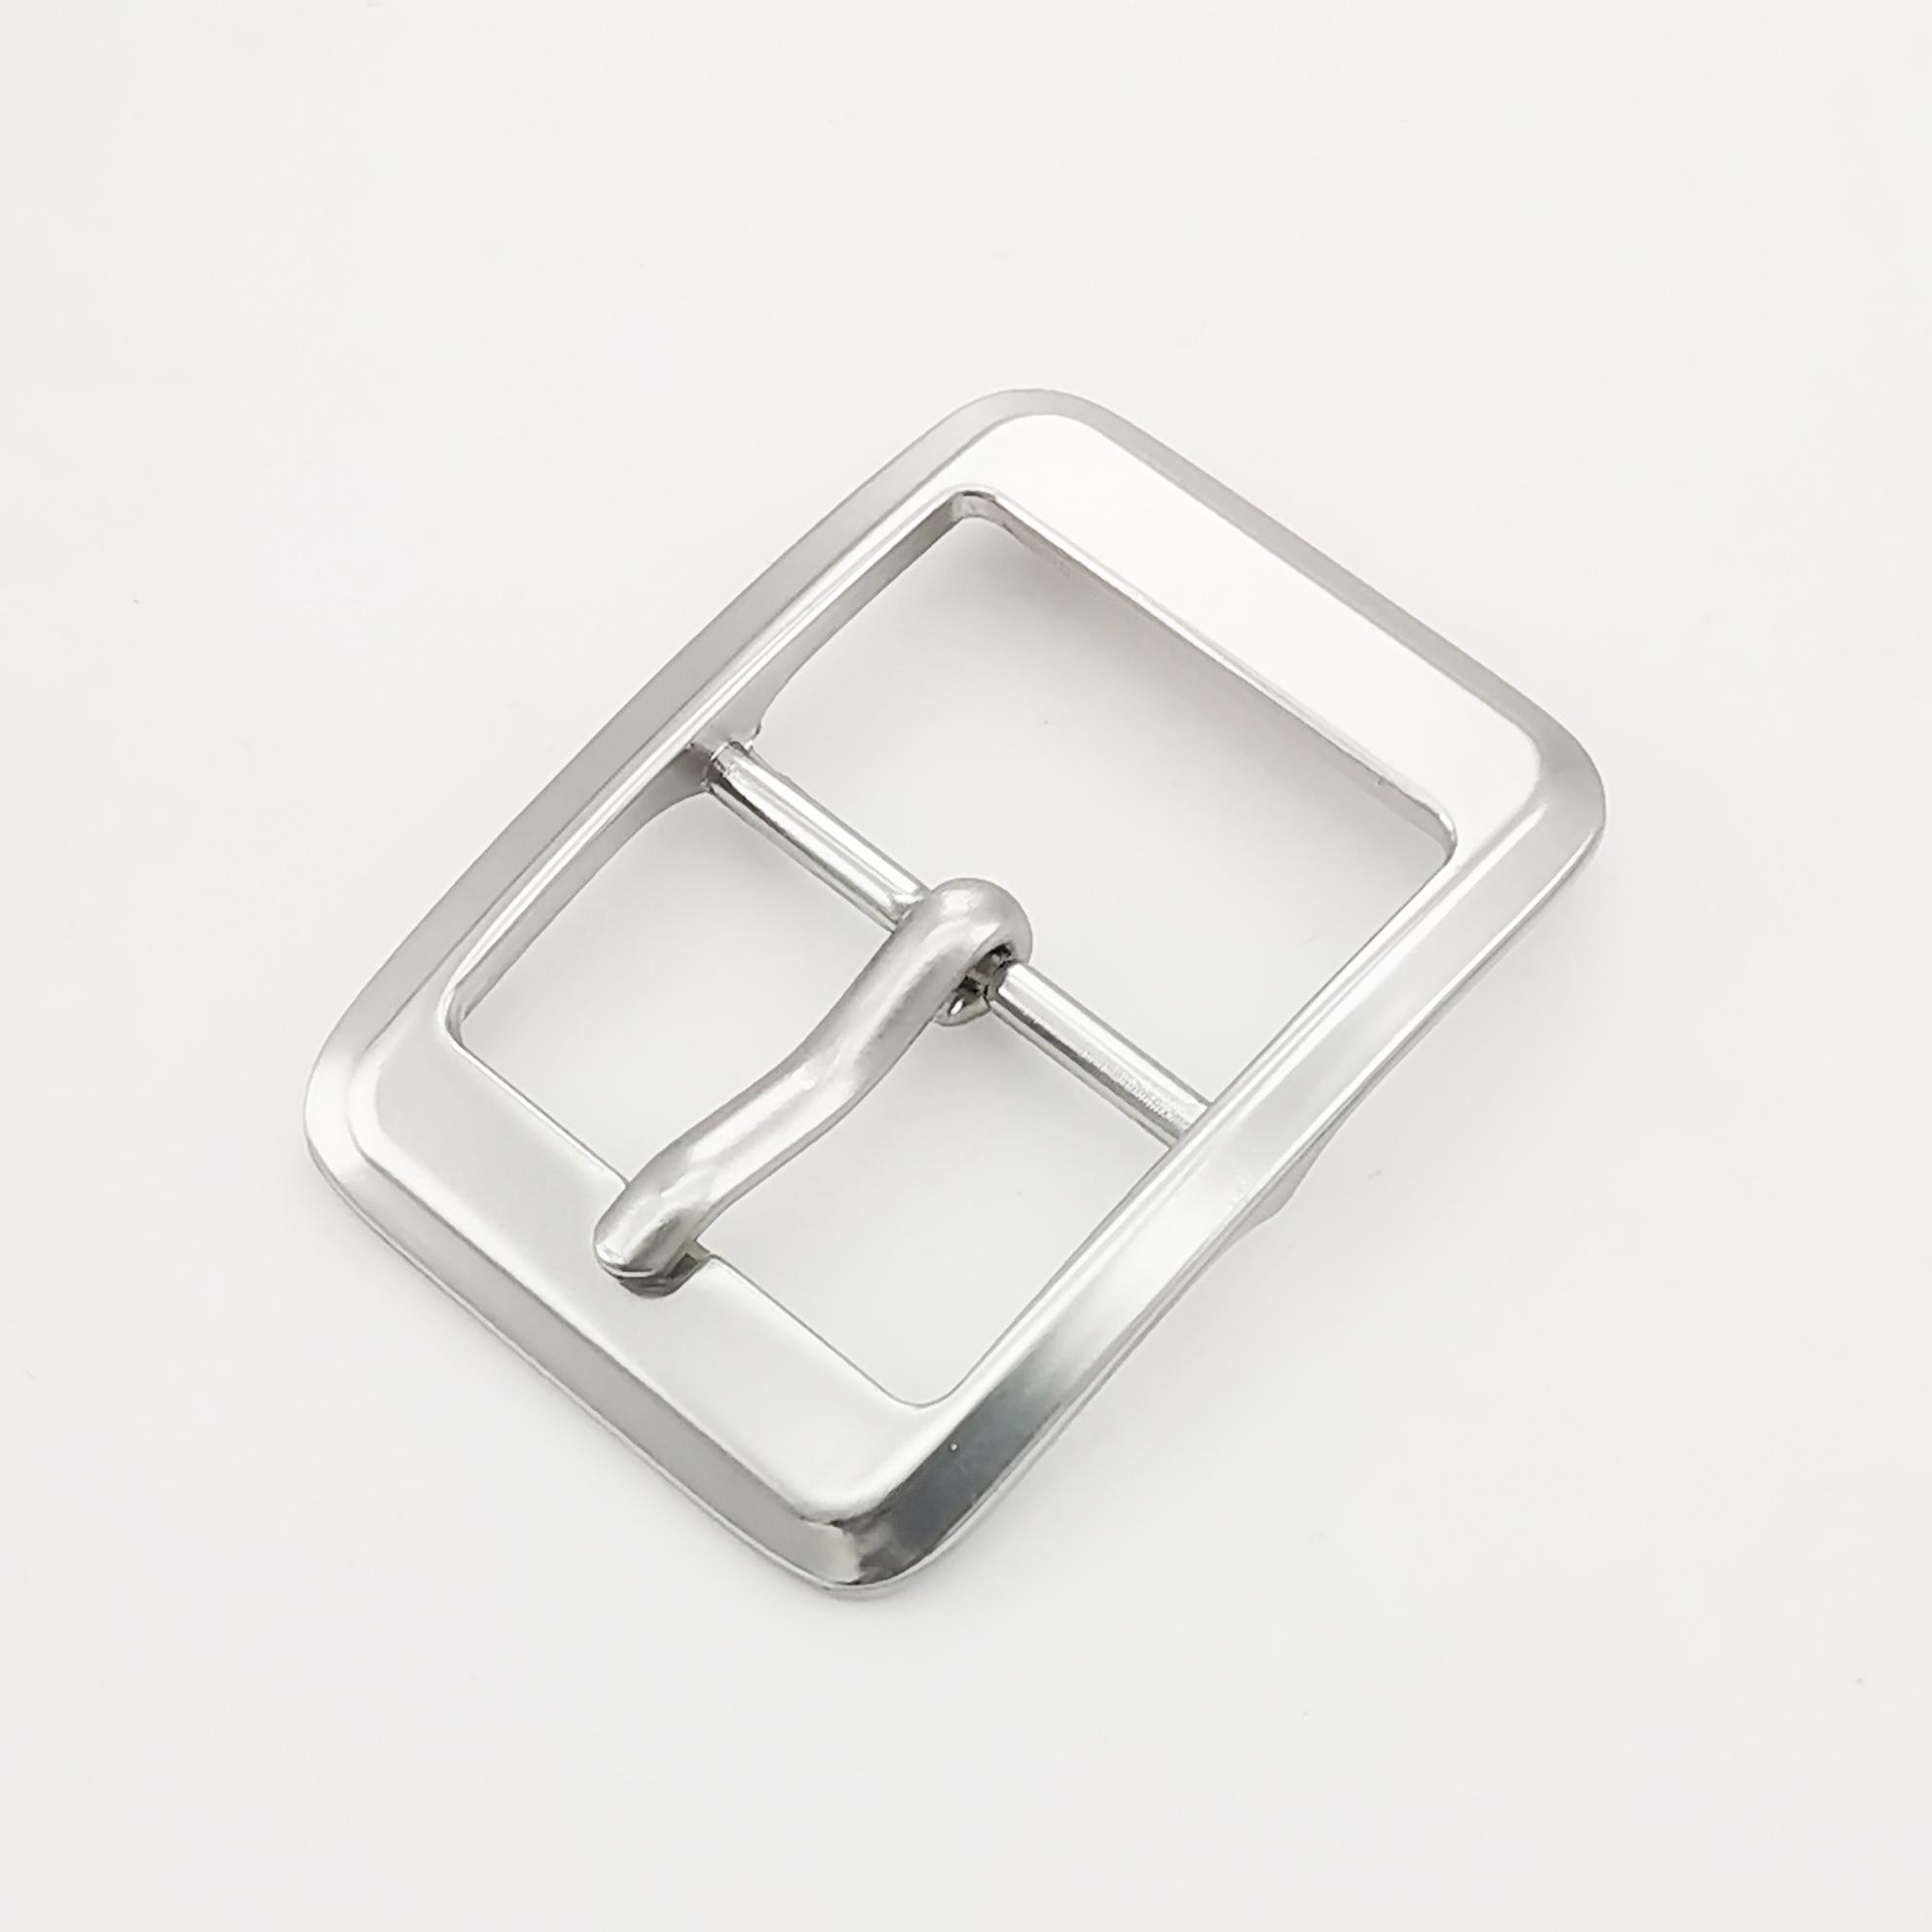 Quality-Assured New Fashion Lady Women alloy Metal Belt Buckle